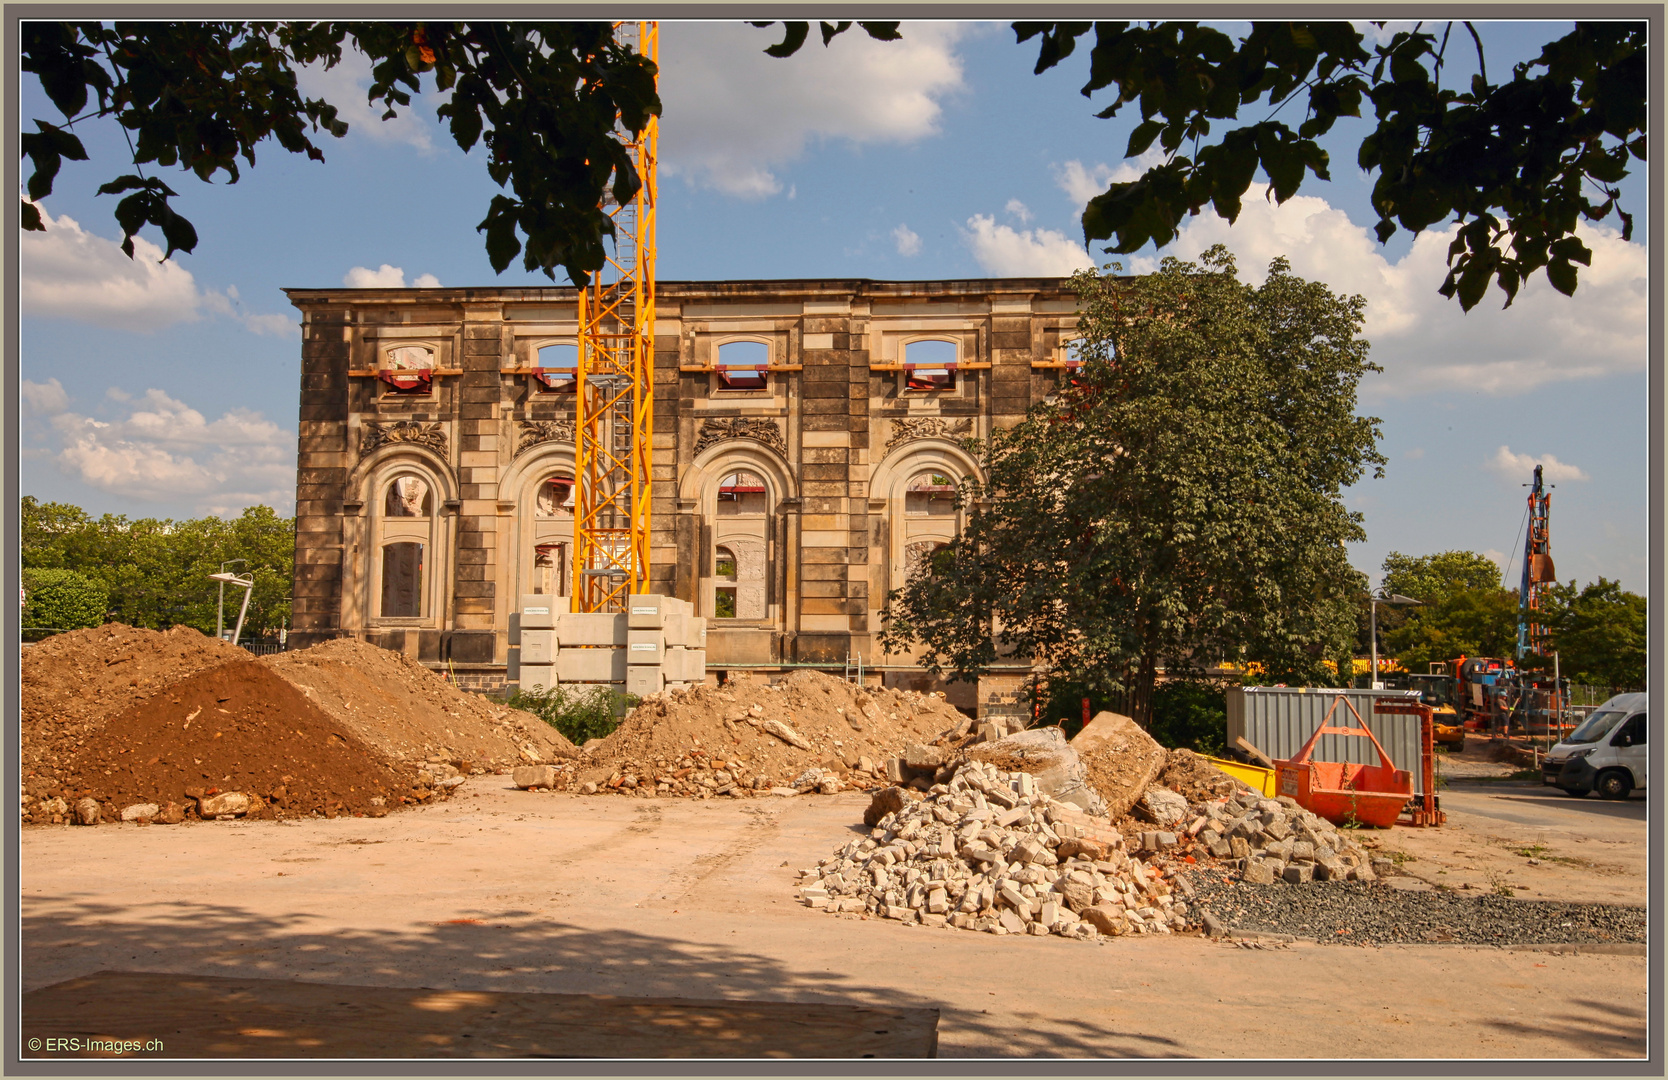 Dresden Blockhaus 20 2020-07-20 374 (8) ©